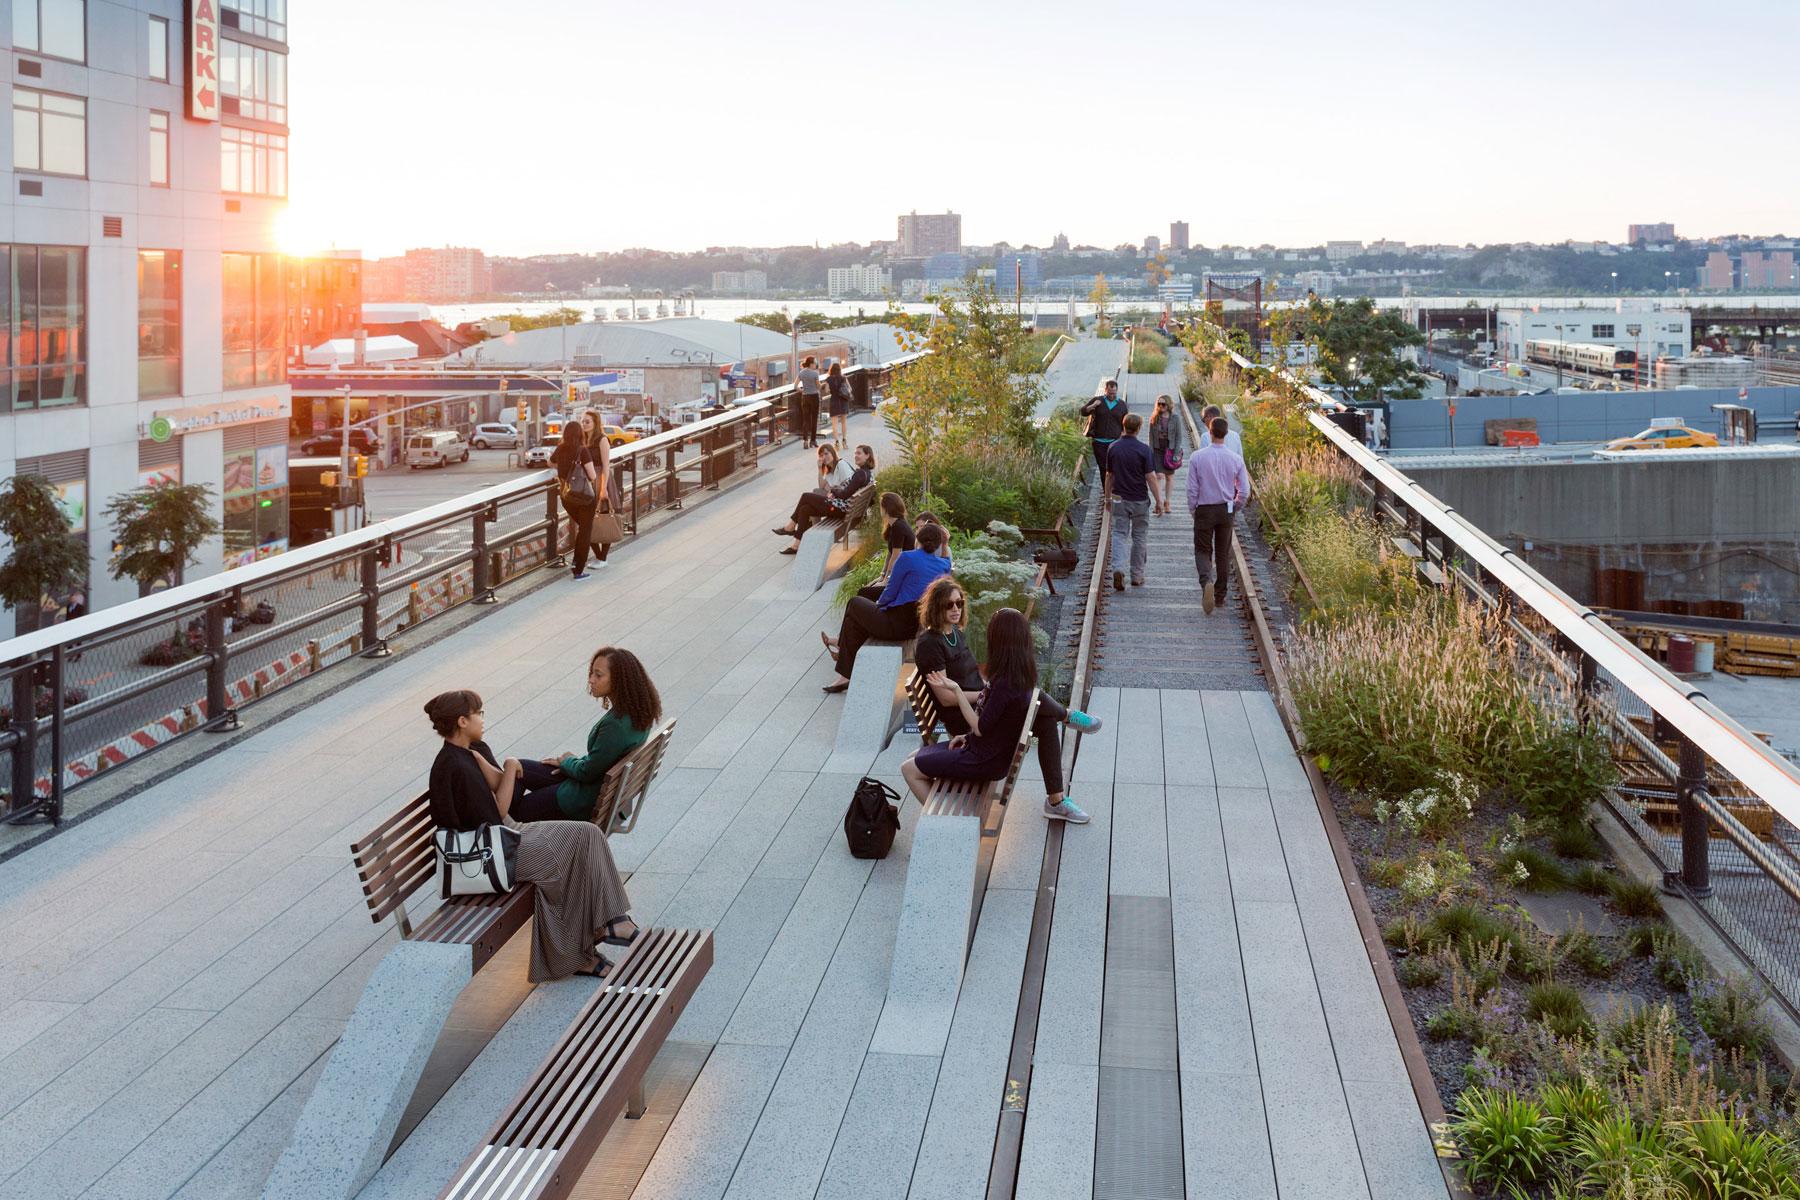 High Line (Foto: Iwan Baan)